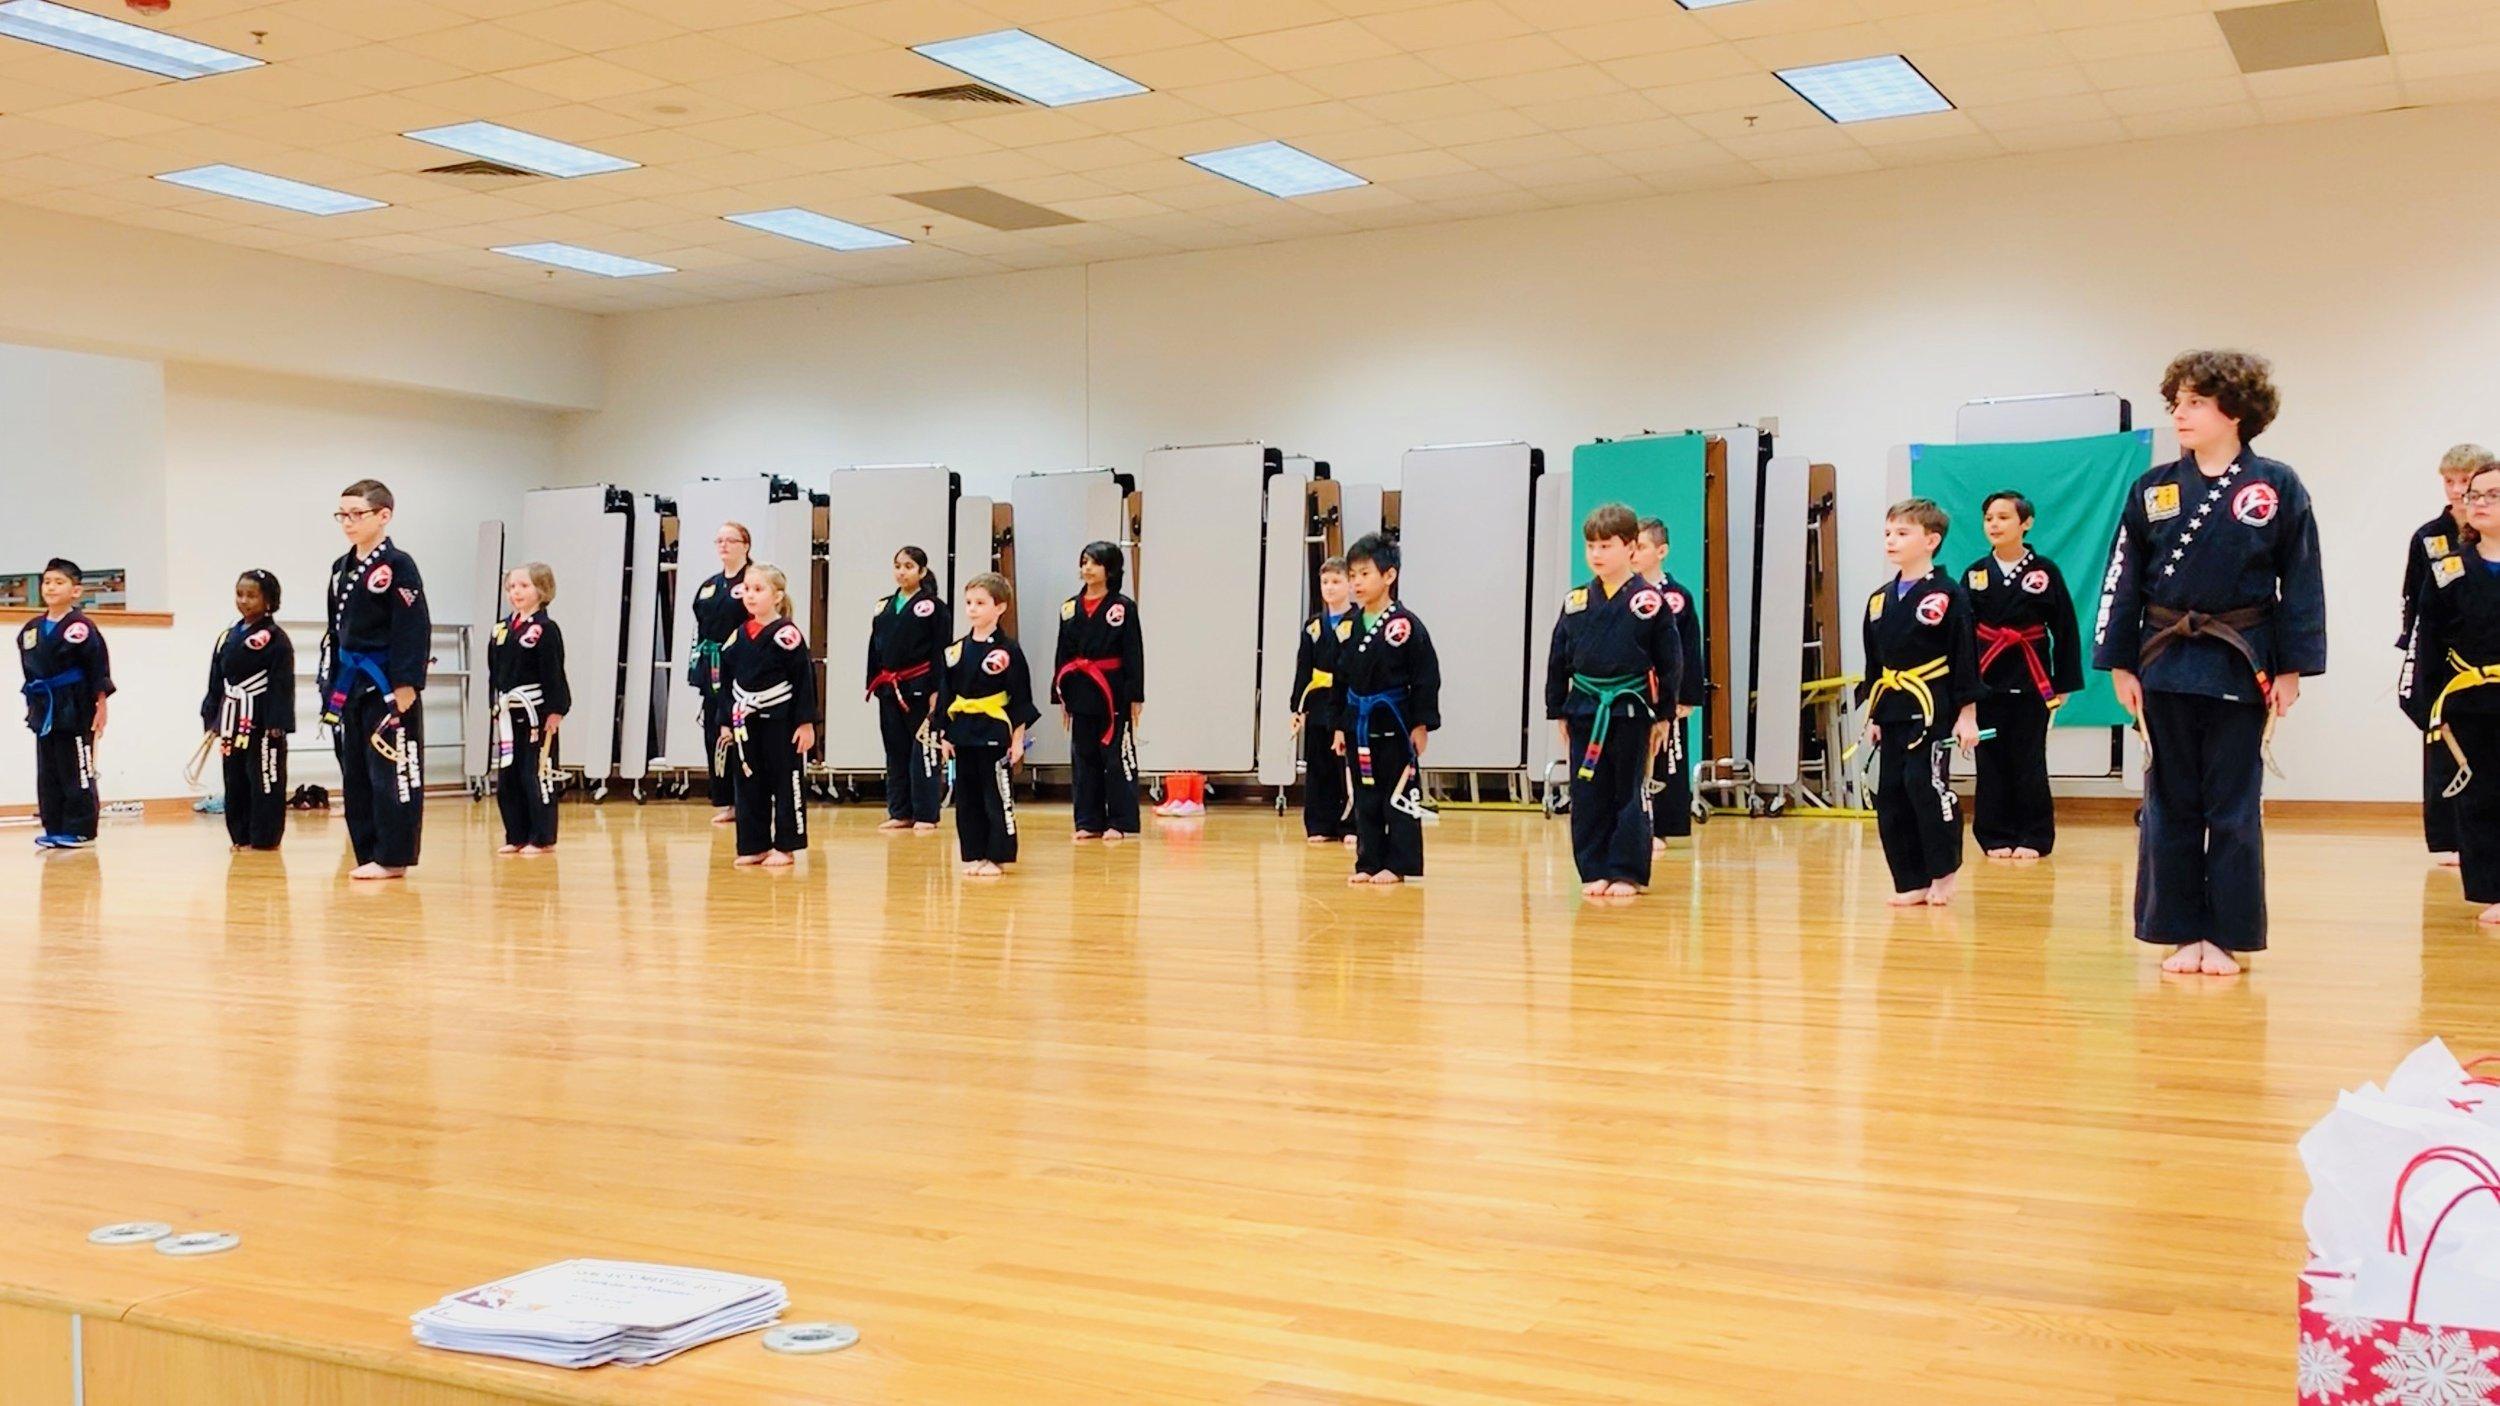 10th Annual Potluck Dinner & Awards — Spicar's Martial Arts